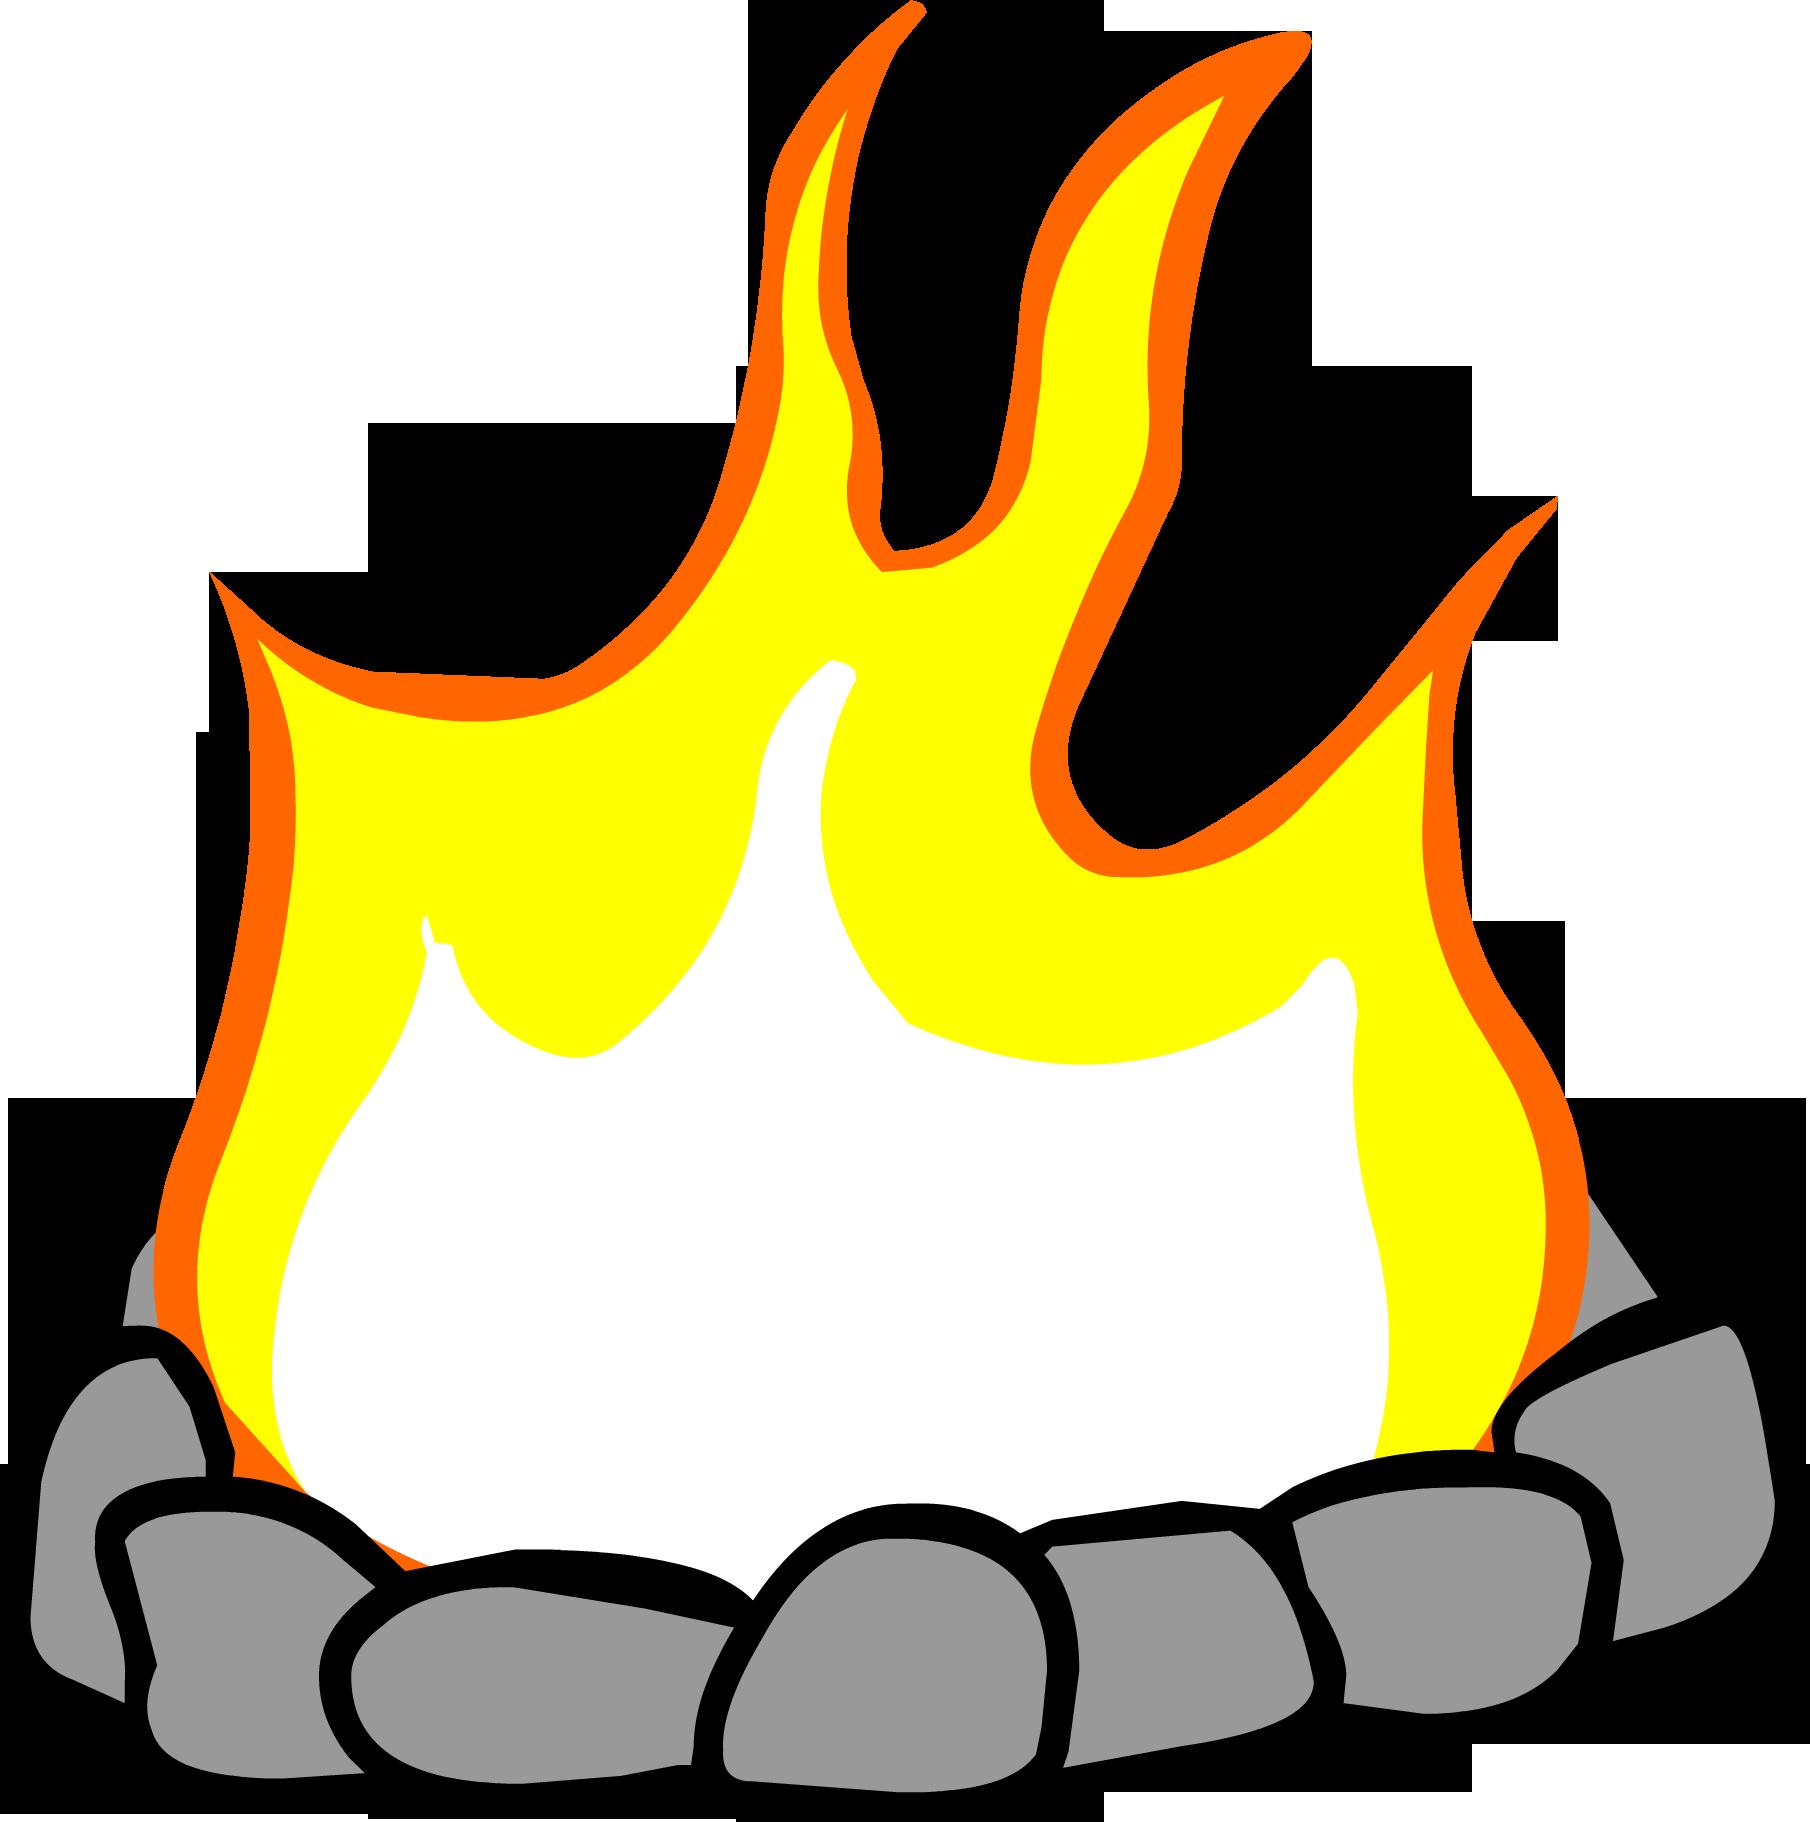 Image png club penguin. Campfire clipart fire pit